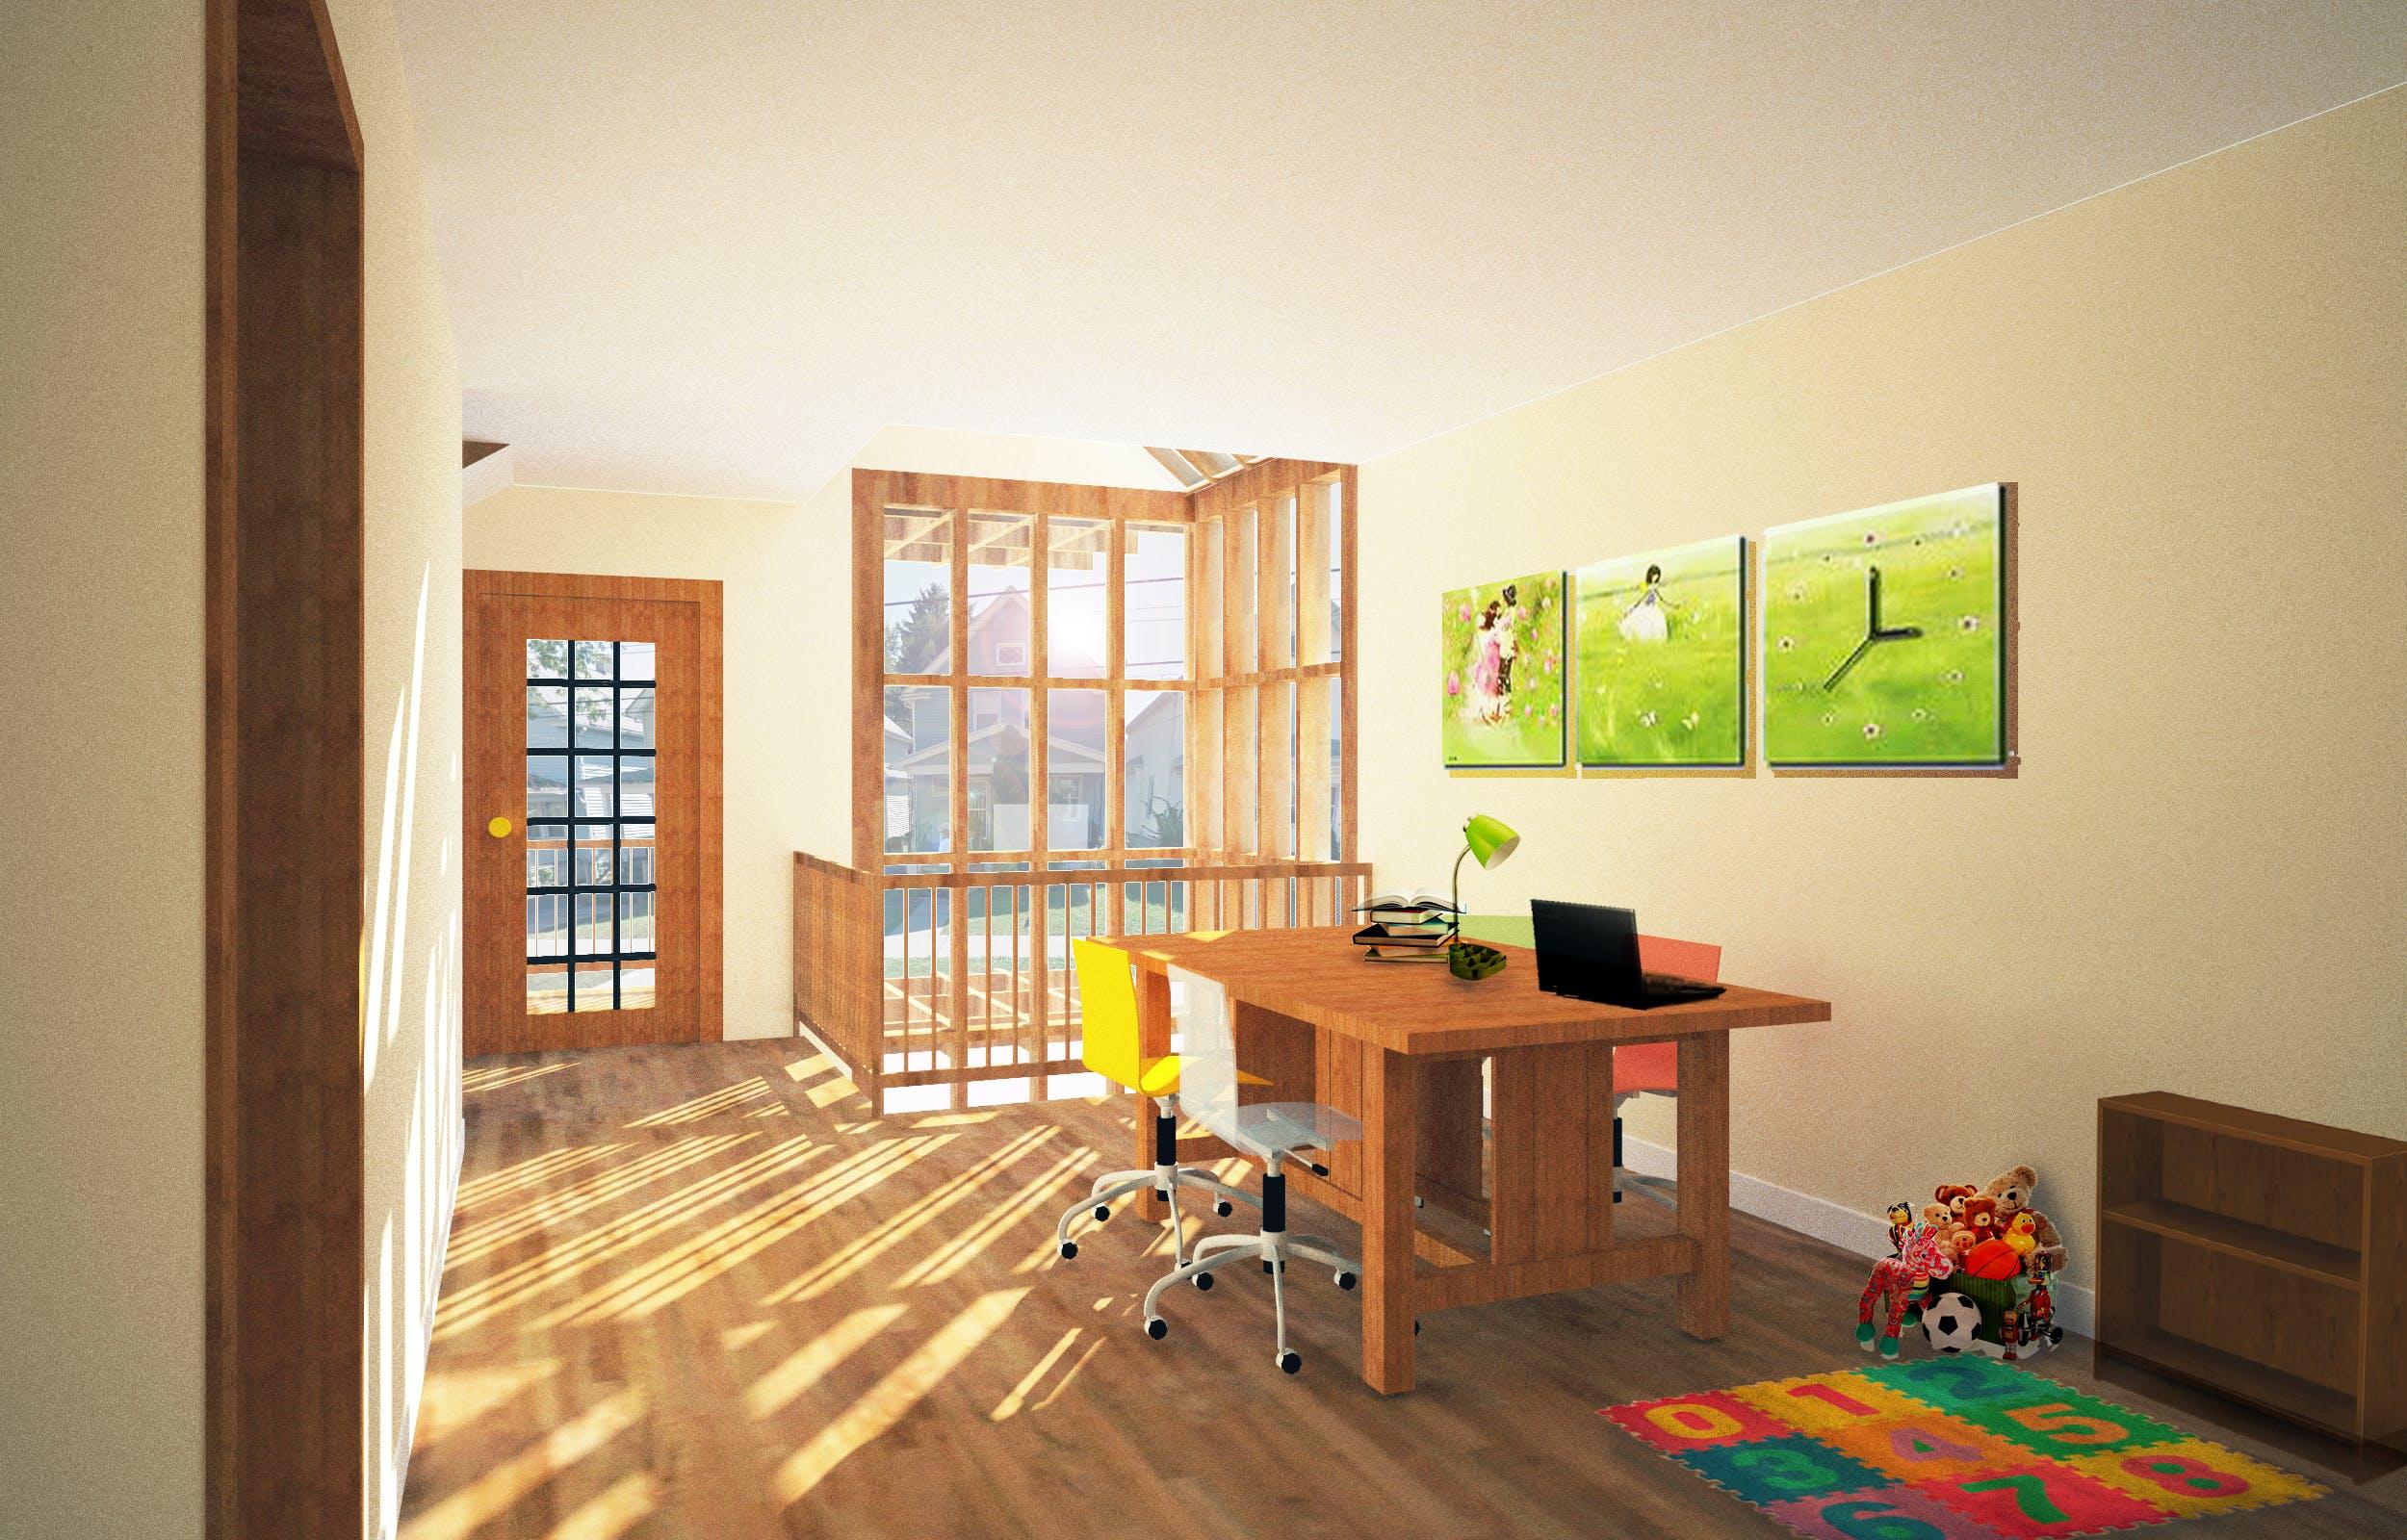 Sustainable Design Affordability: Habitat For Humanity- Sustainability, Affordability